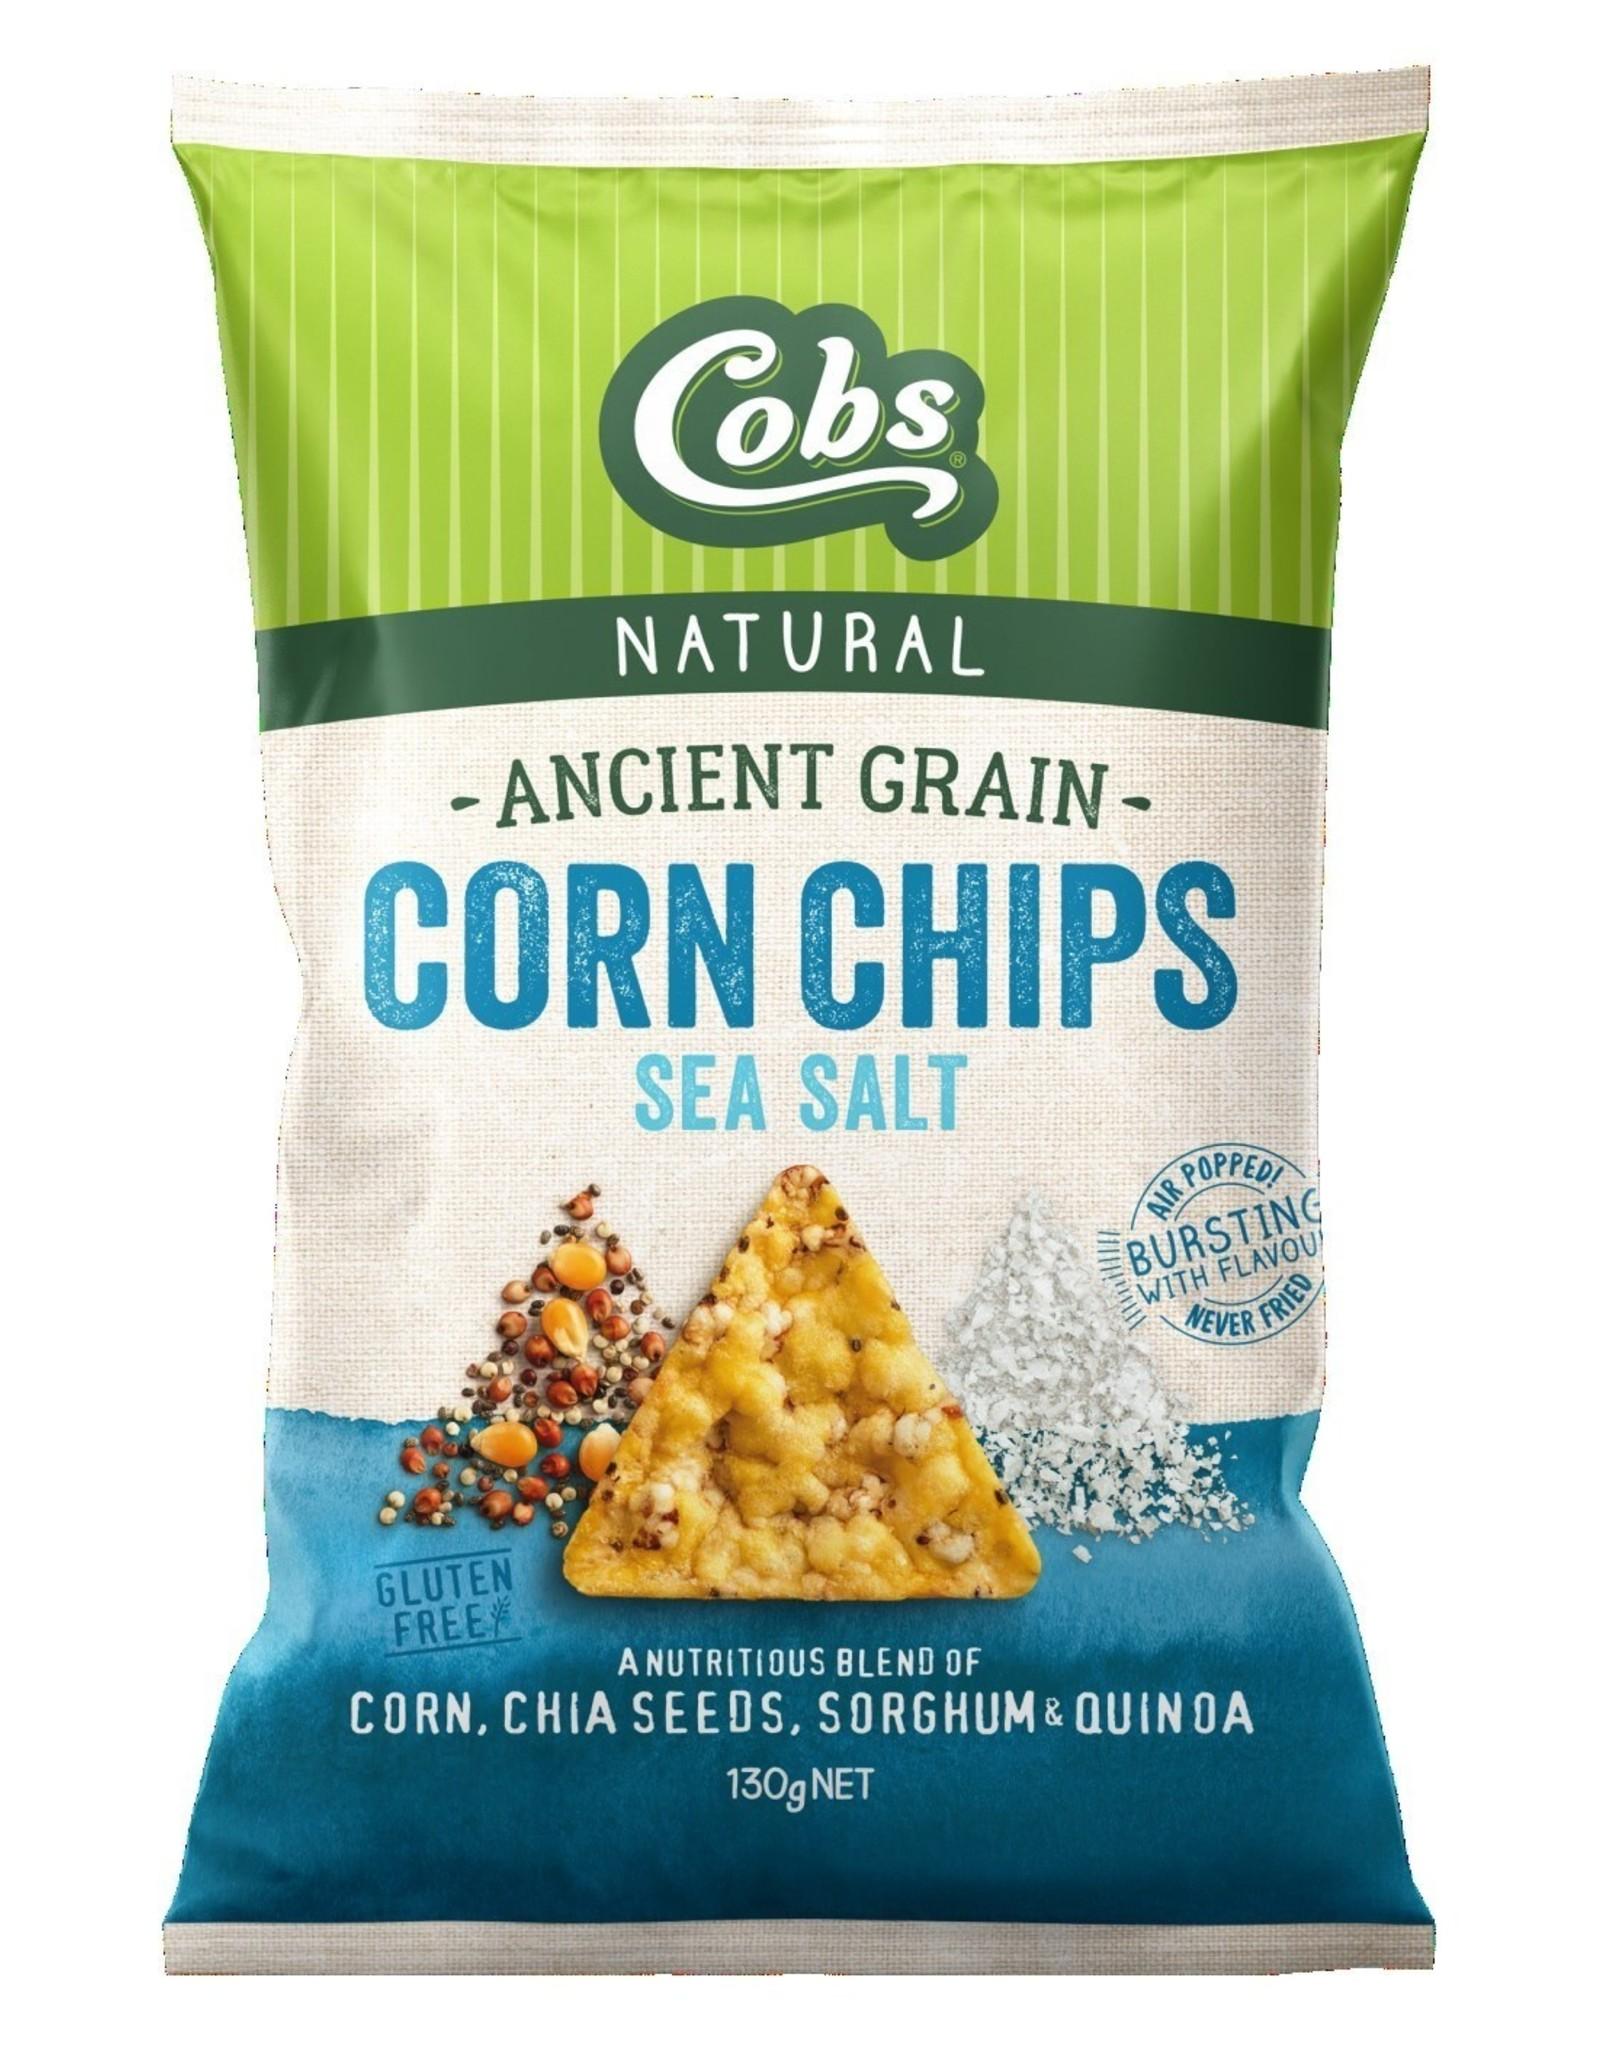 Cobs Ancient Grain Corn Chips Sea Salt 130g